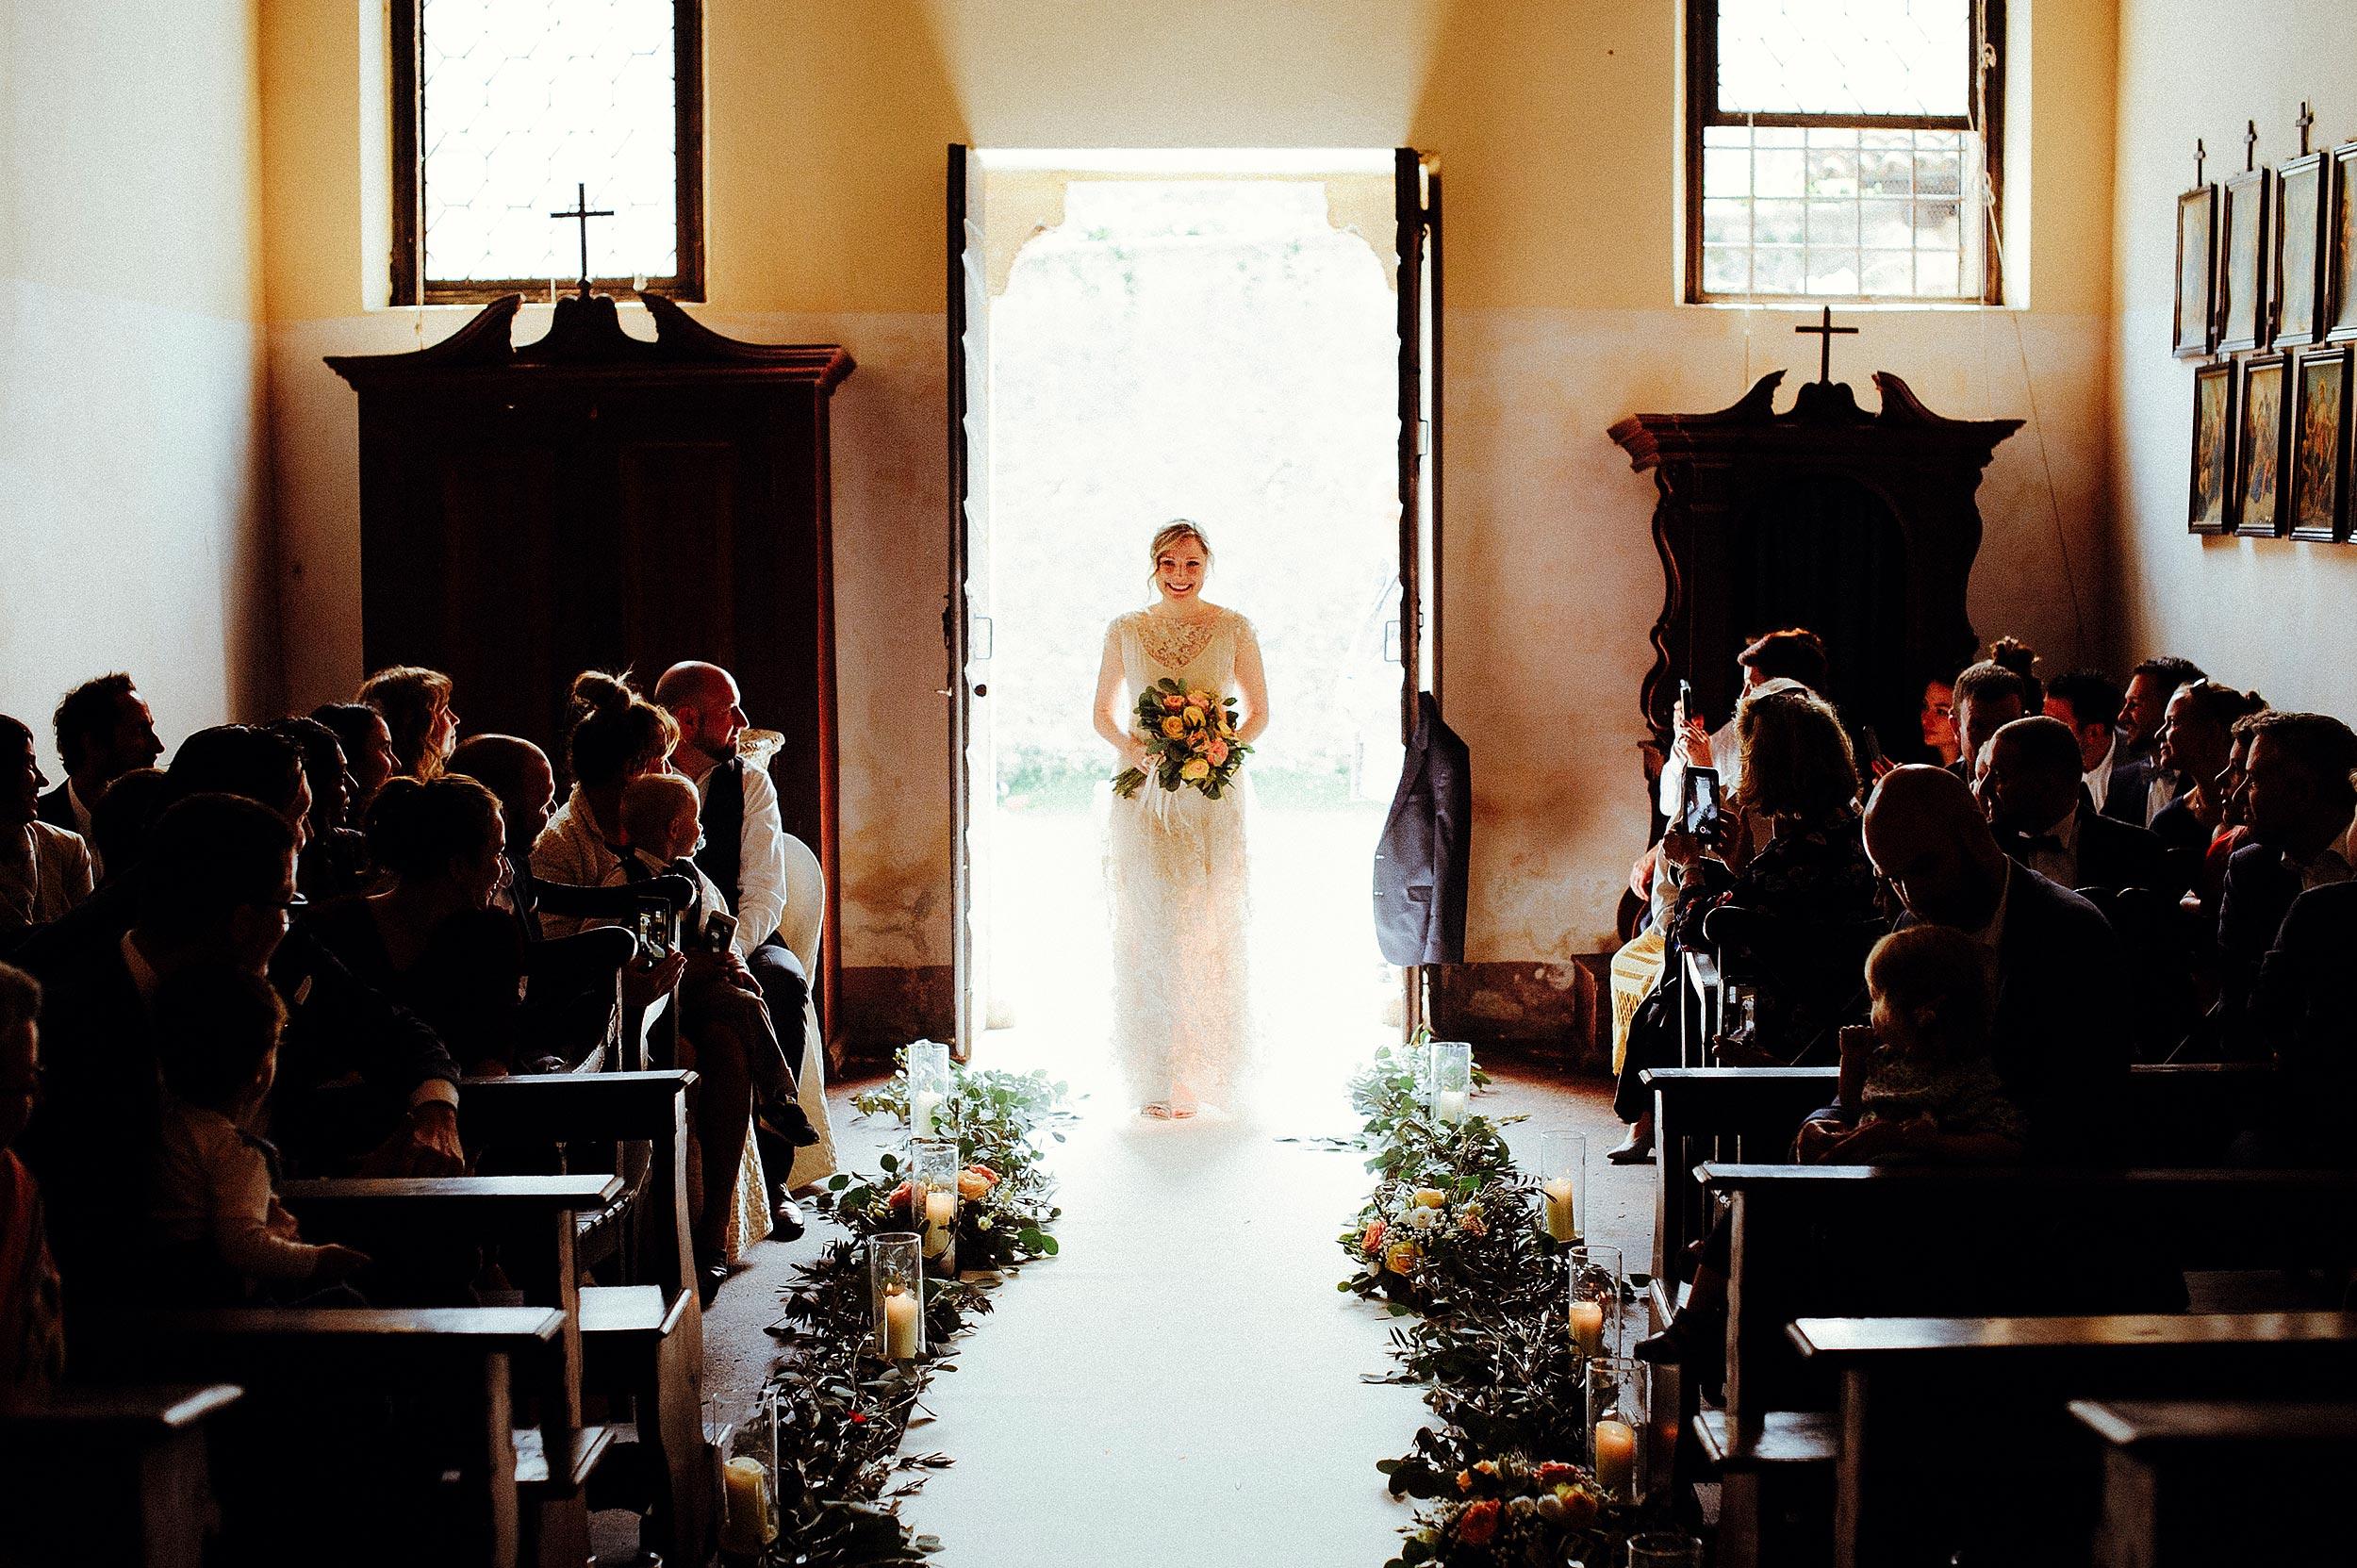 Villa Piovene Chruch The Bride Enters Wedding Photographer Italy Alessandro Avenali